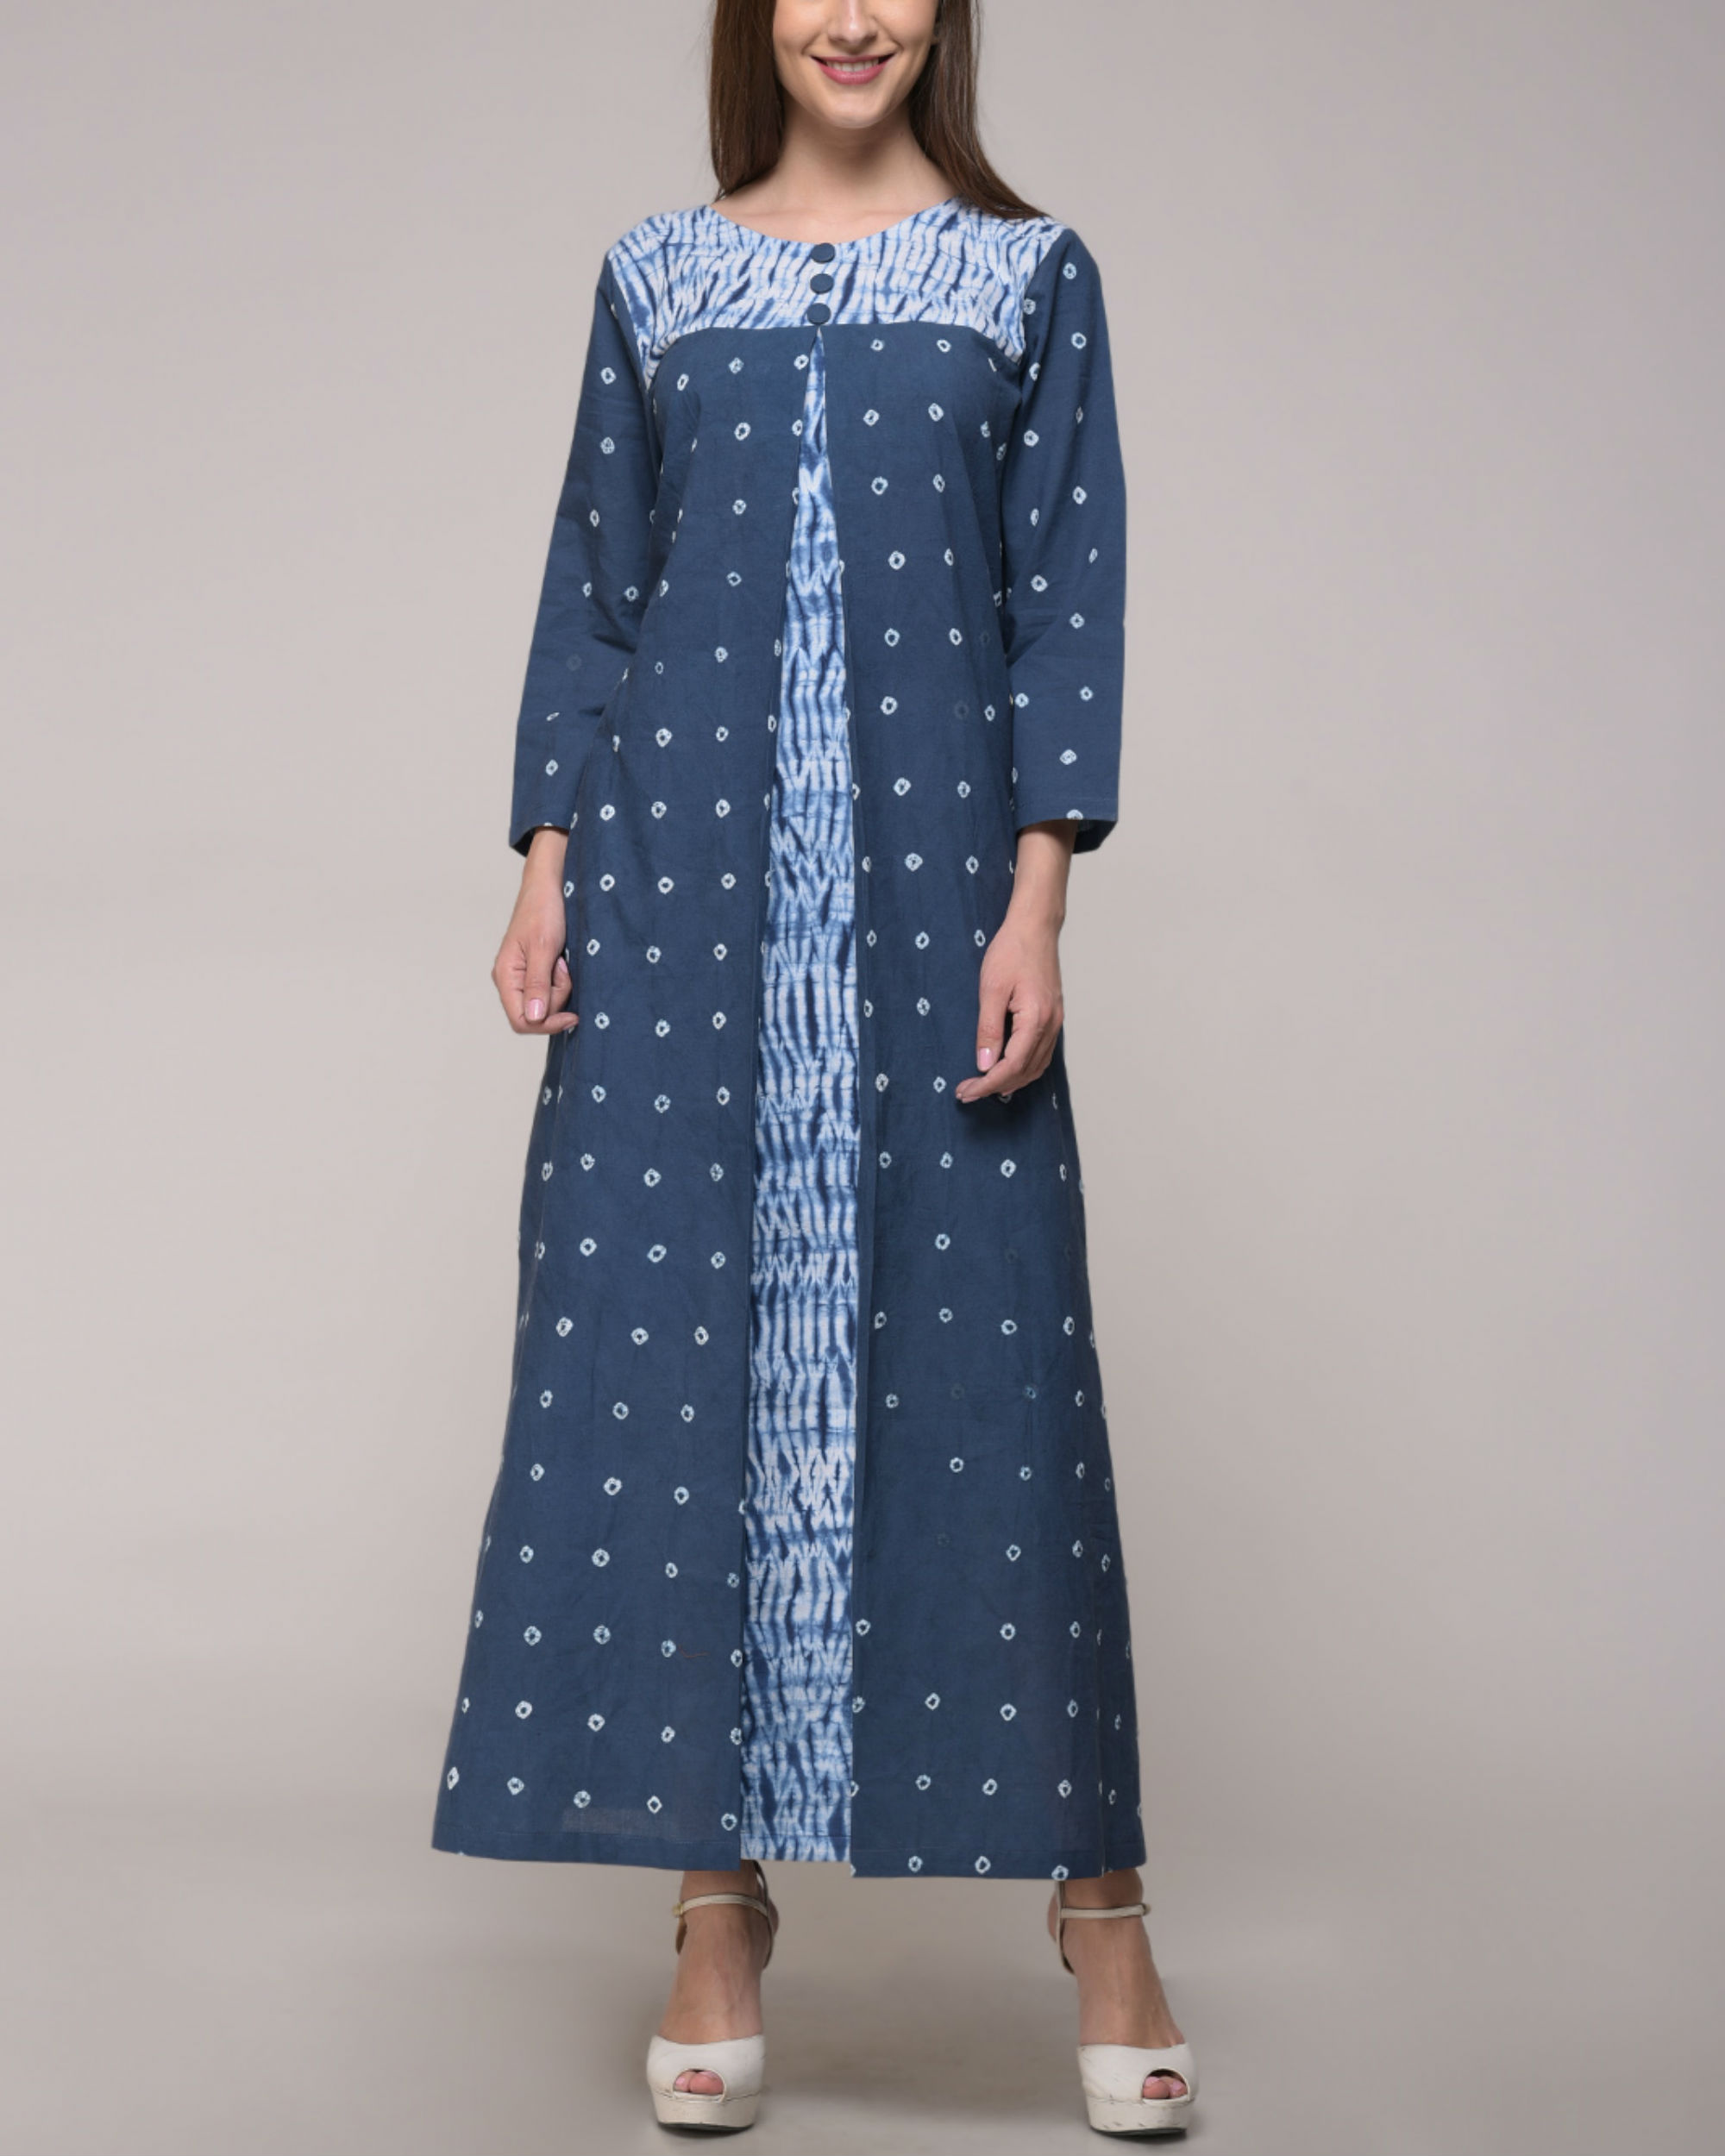 Shibori tie dye pleated dress